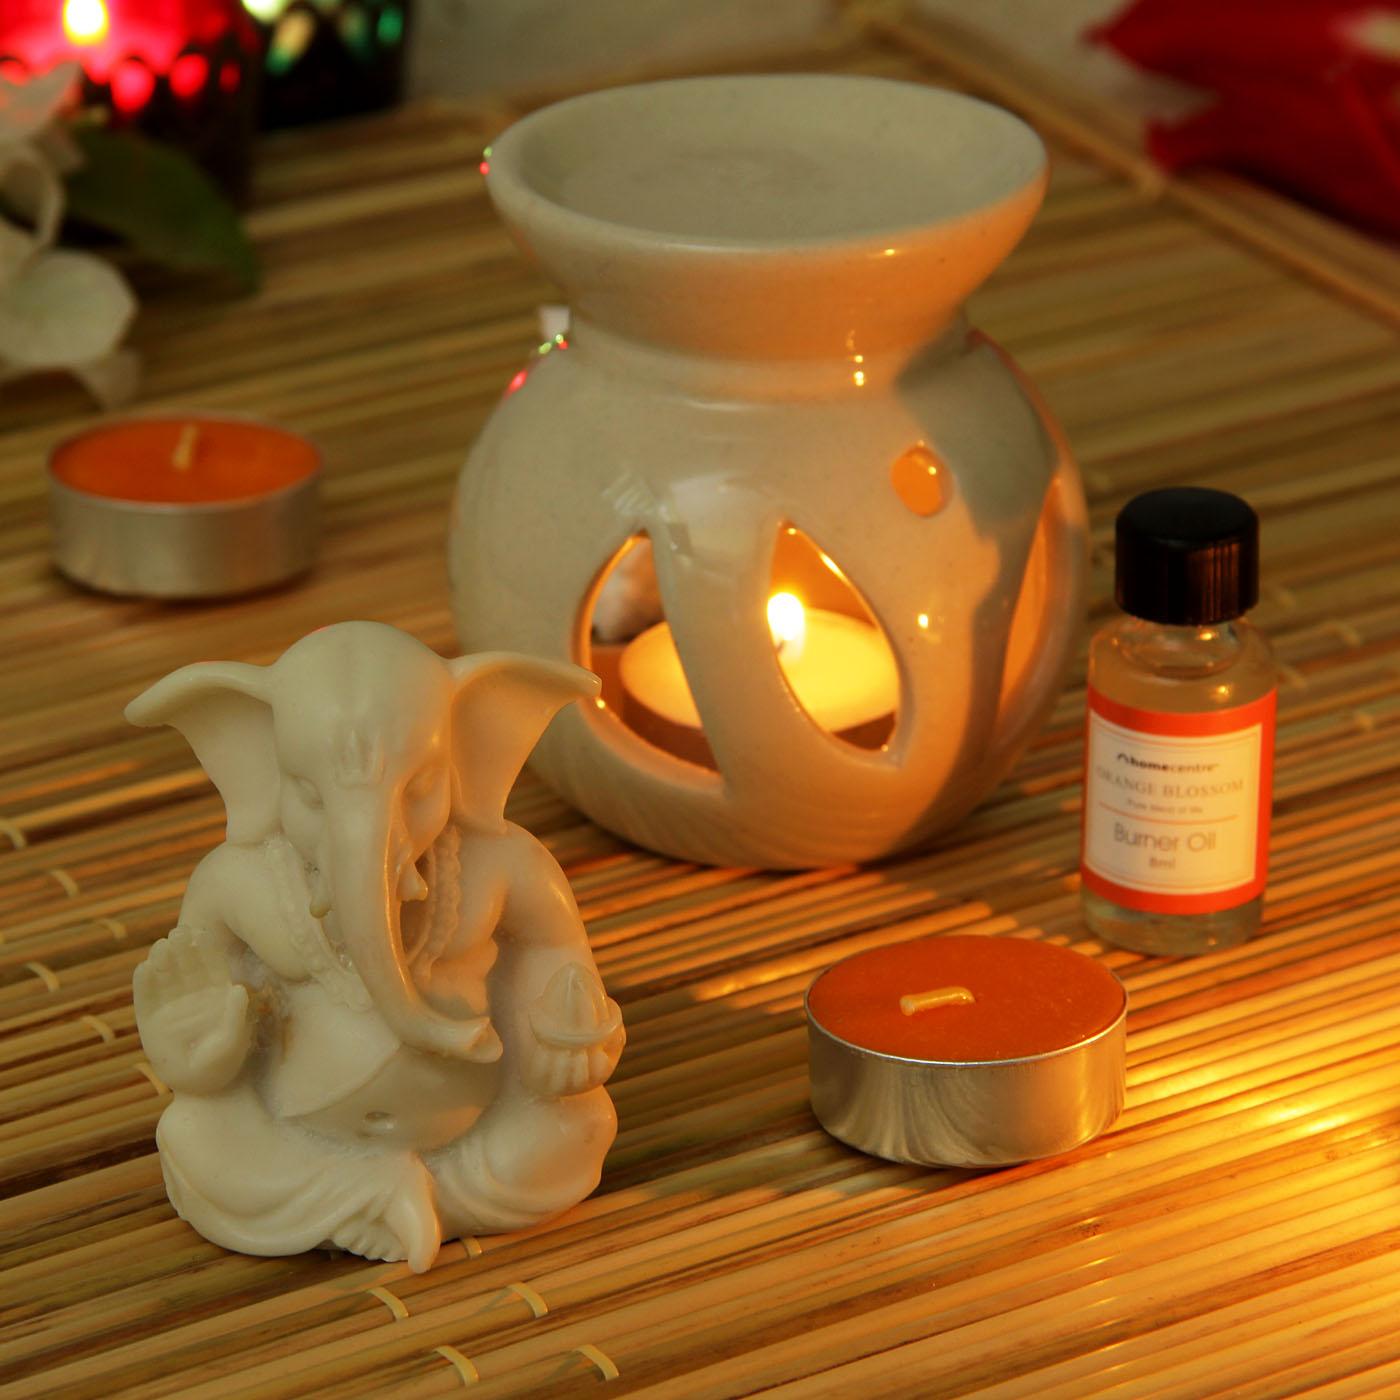 Marble Ganesha Idol & Aroma Diffuser